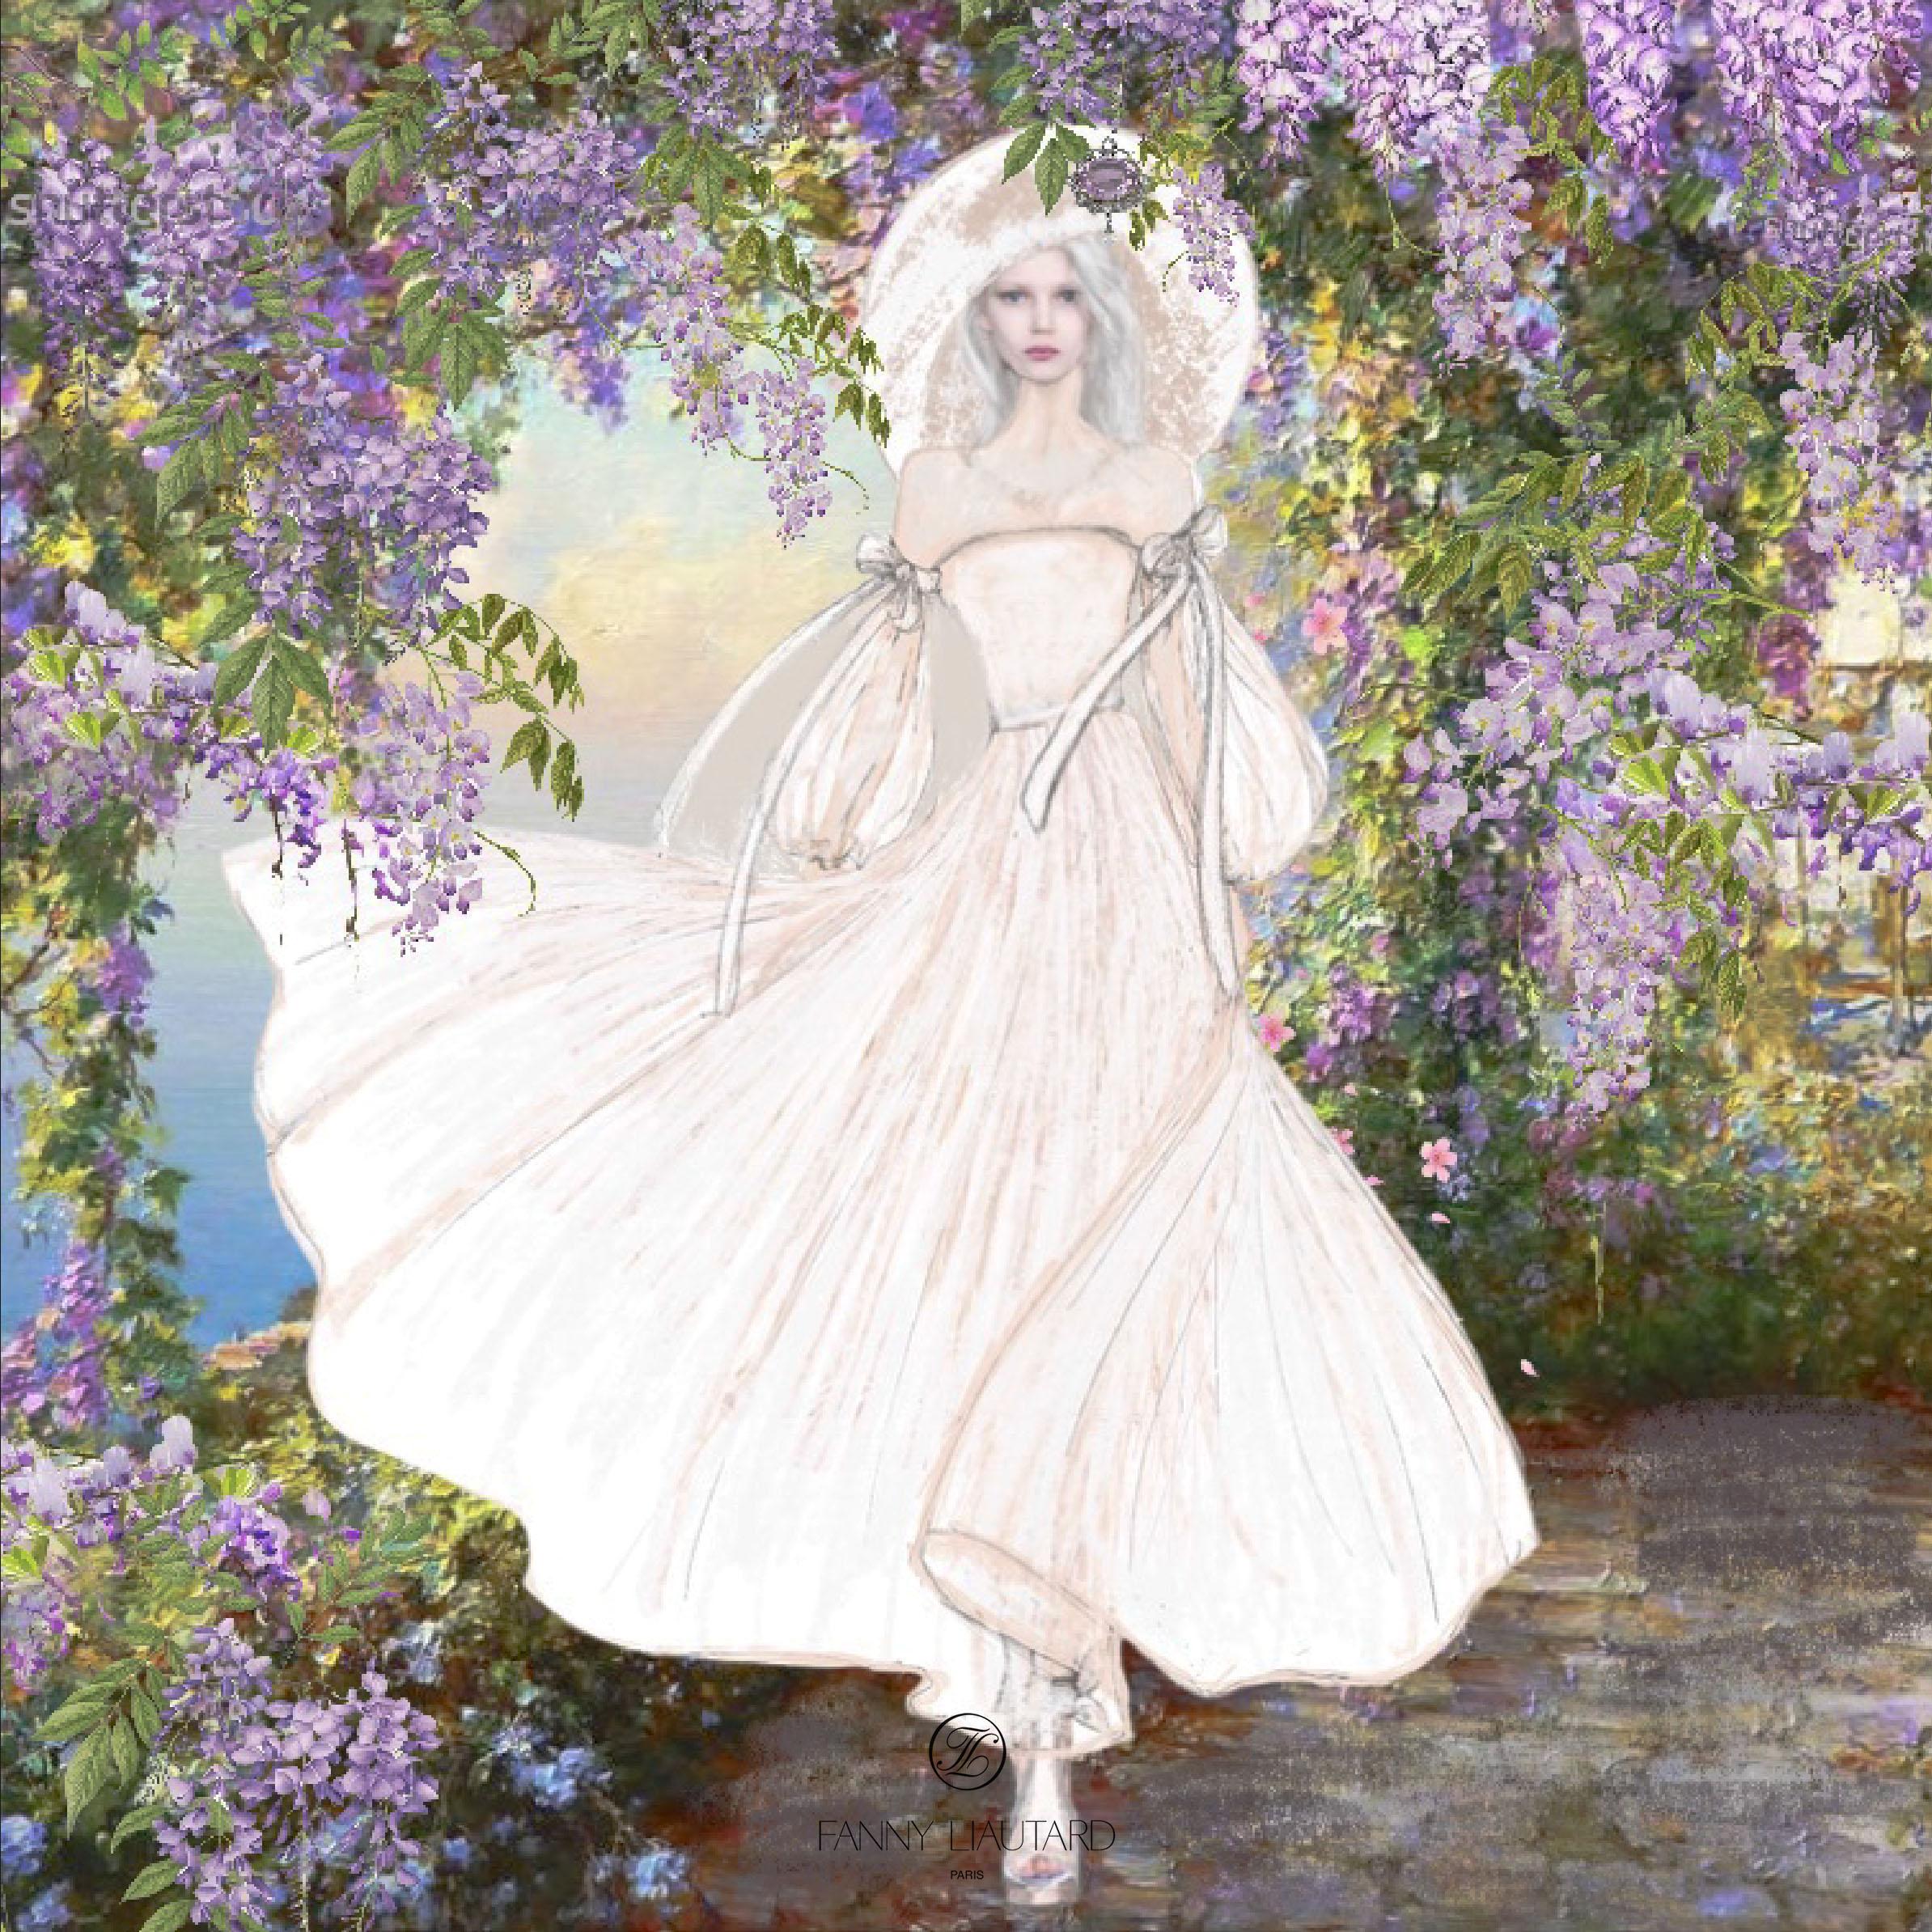 Les glycines parmes-Fanny Liautard-robe